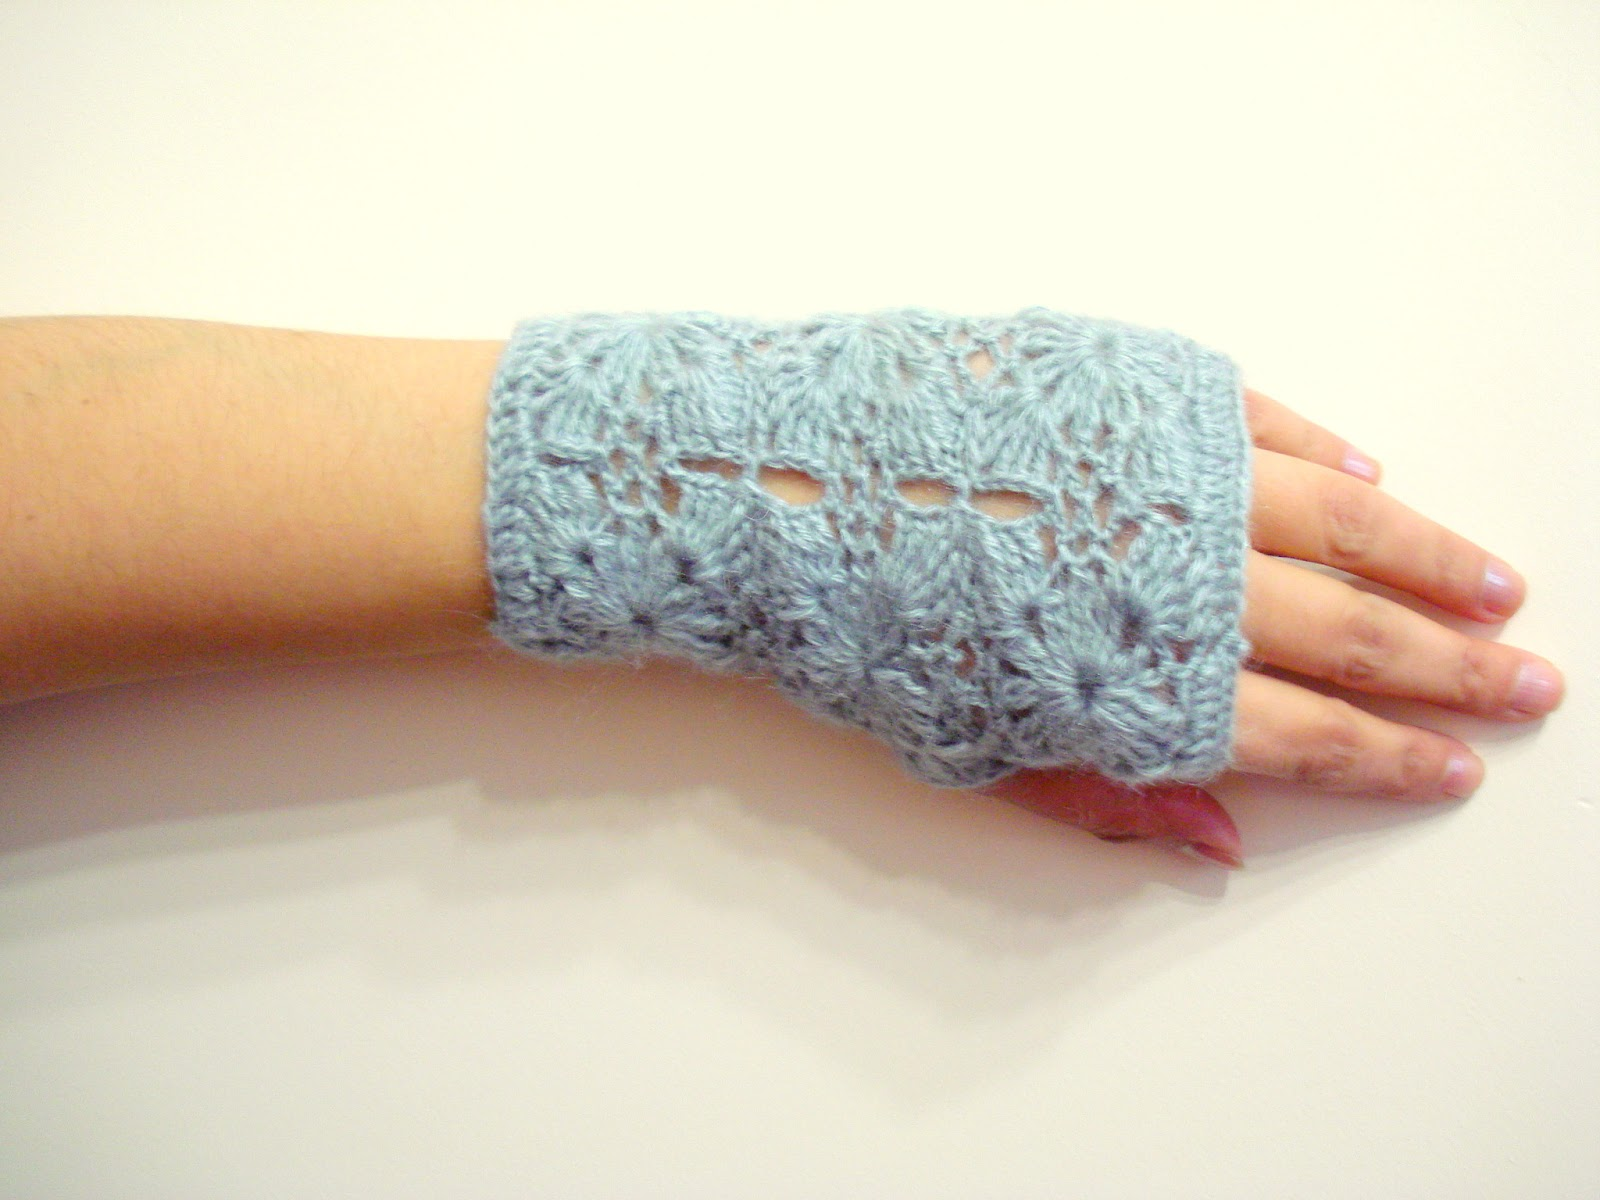 Crocheting Gloves : AllSoCute Amigurumis: Lace Crochet Fingerless Gloves - Crochet mittens ...